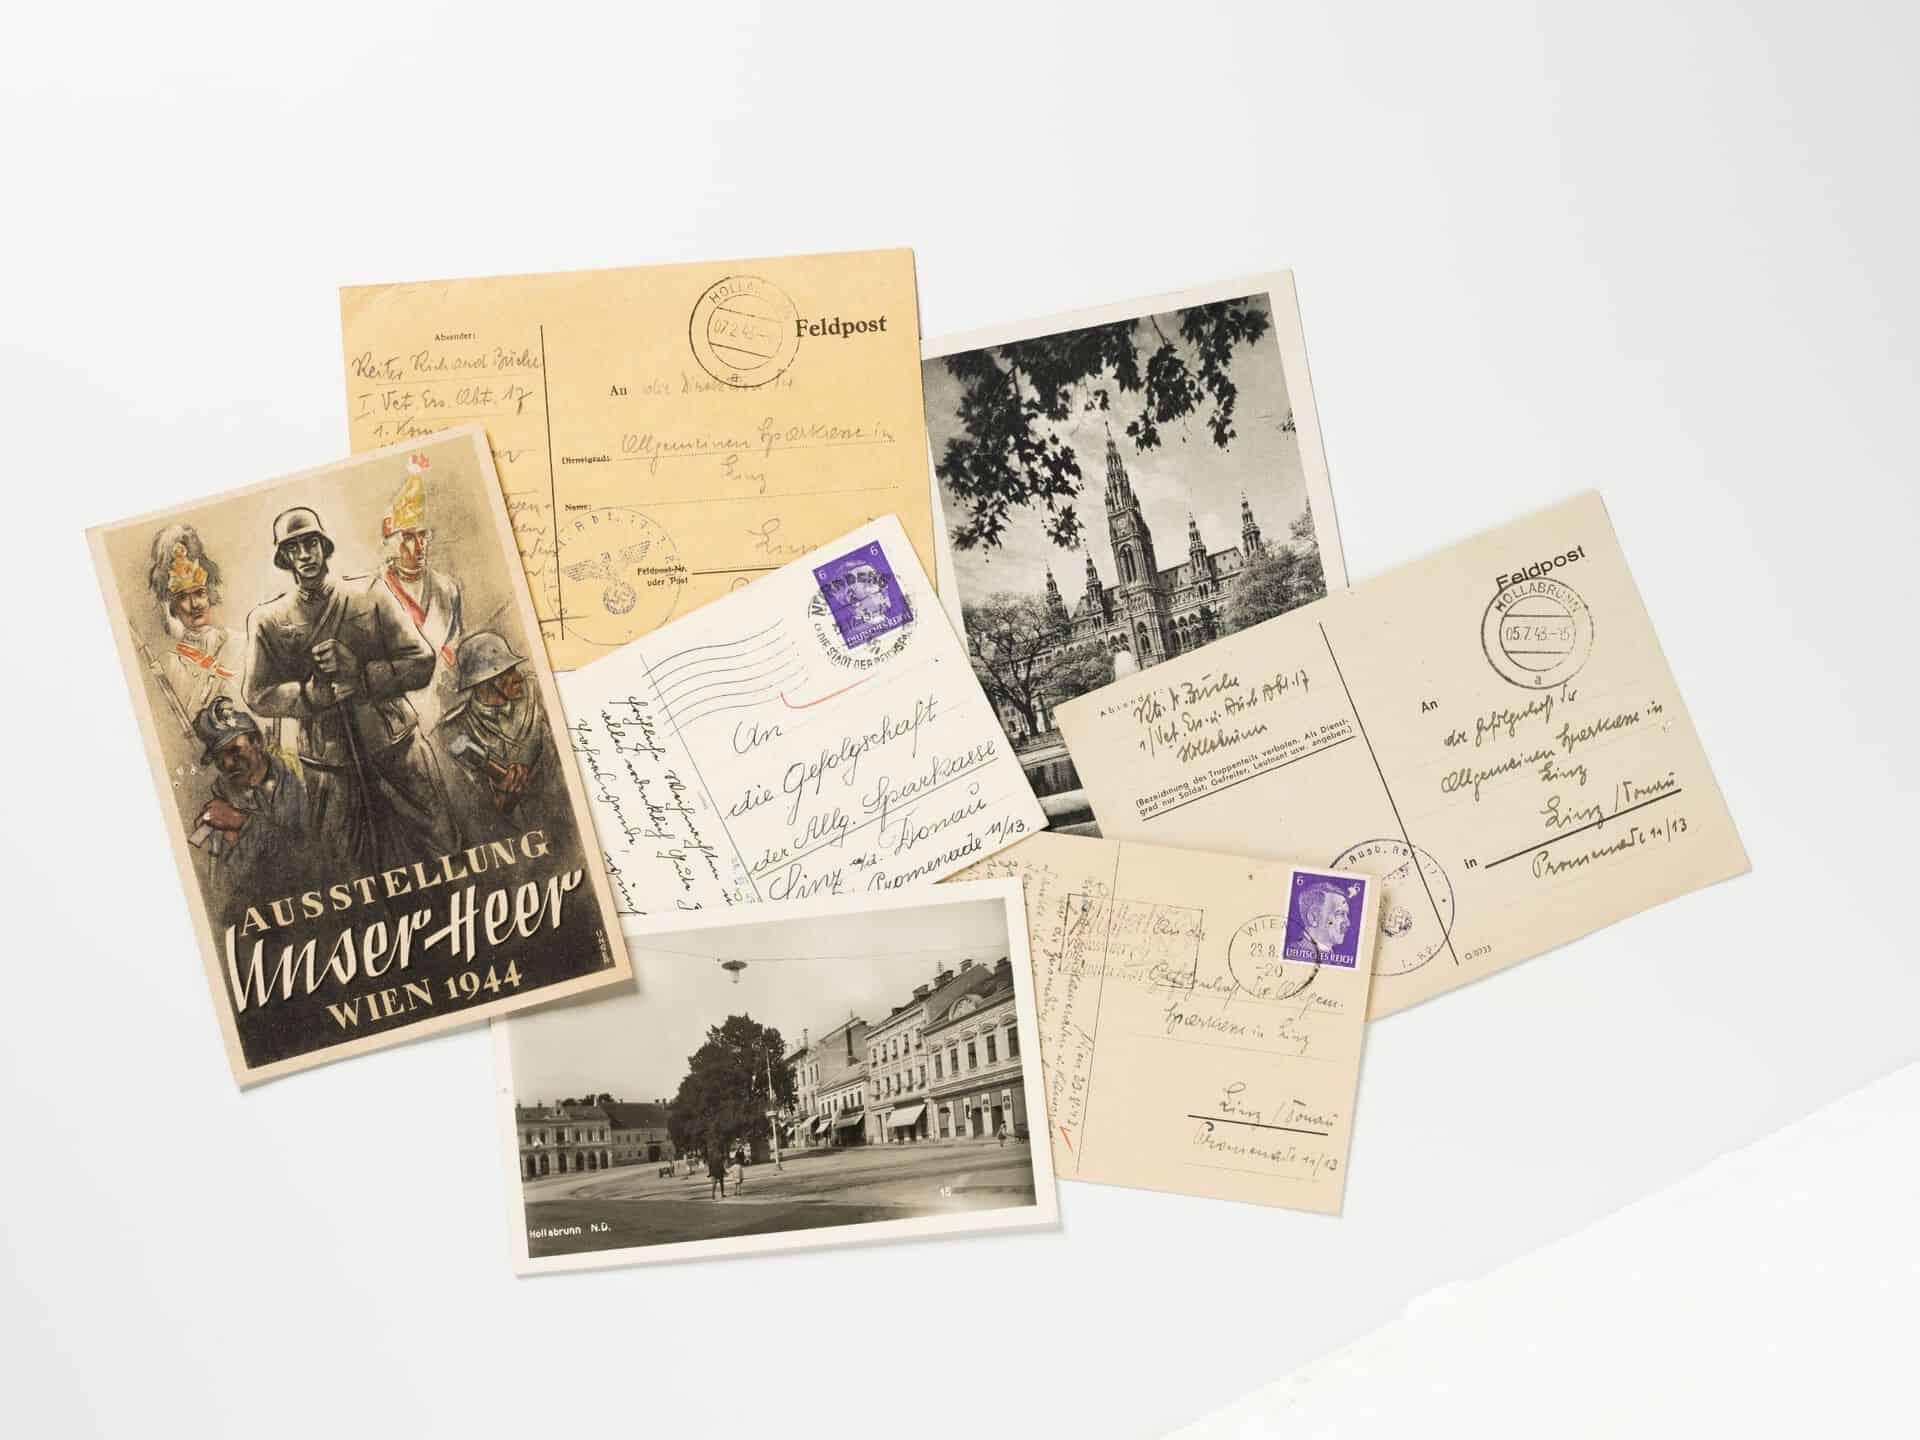 181002-06.05 Frontpostkarte Unser Heer-0062_copyright_Robert_Maybach